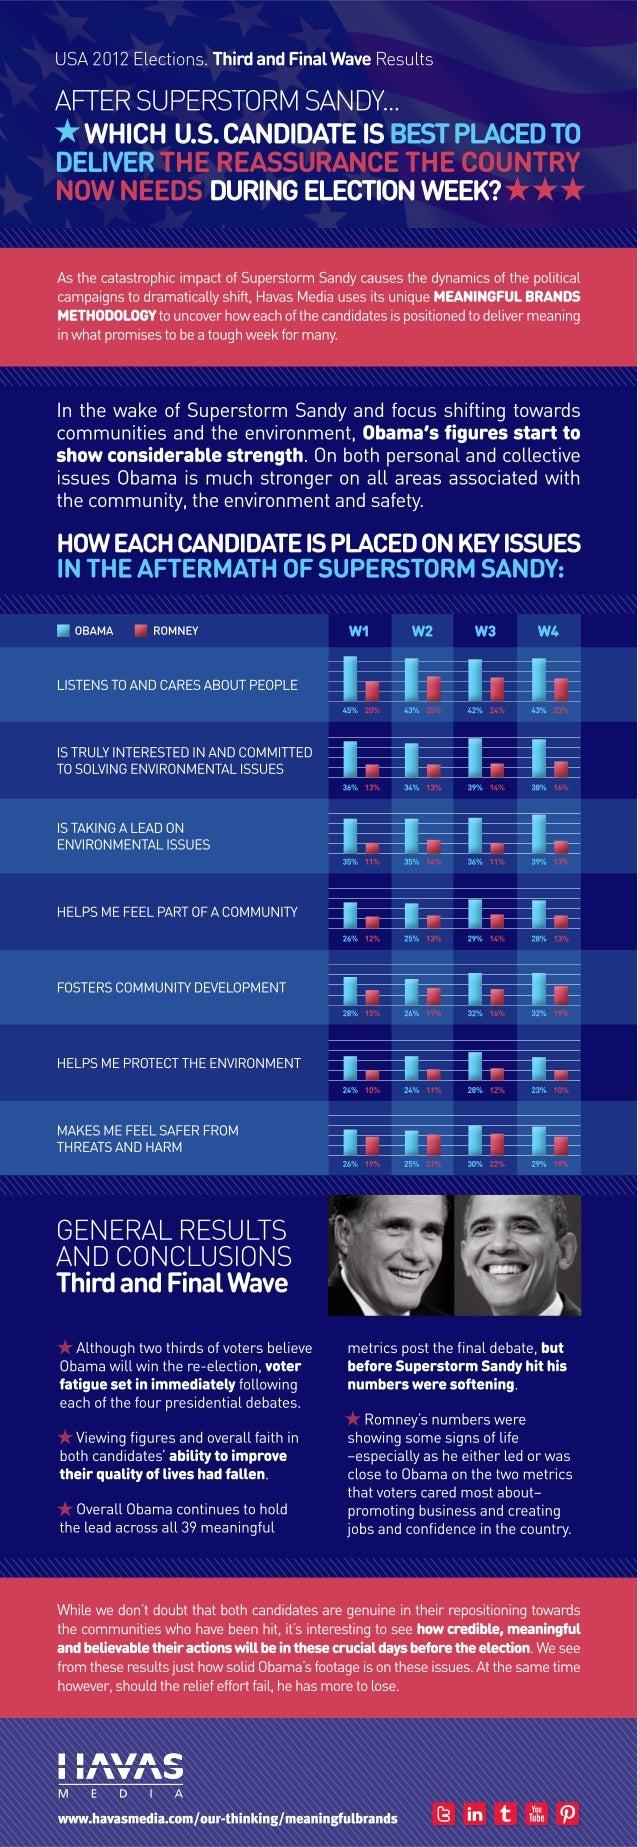 U.S Elections after Storm Sandy